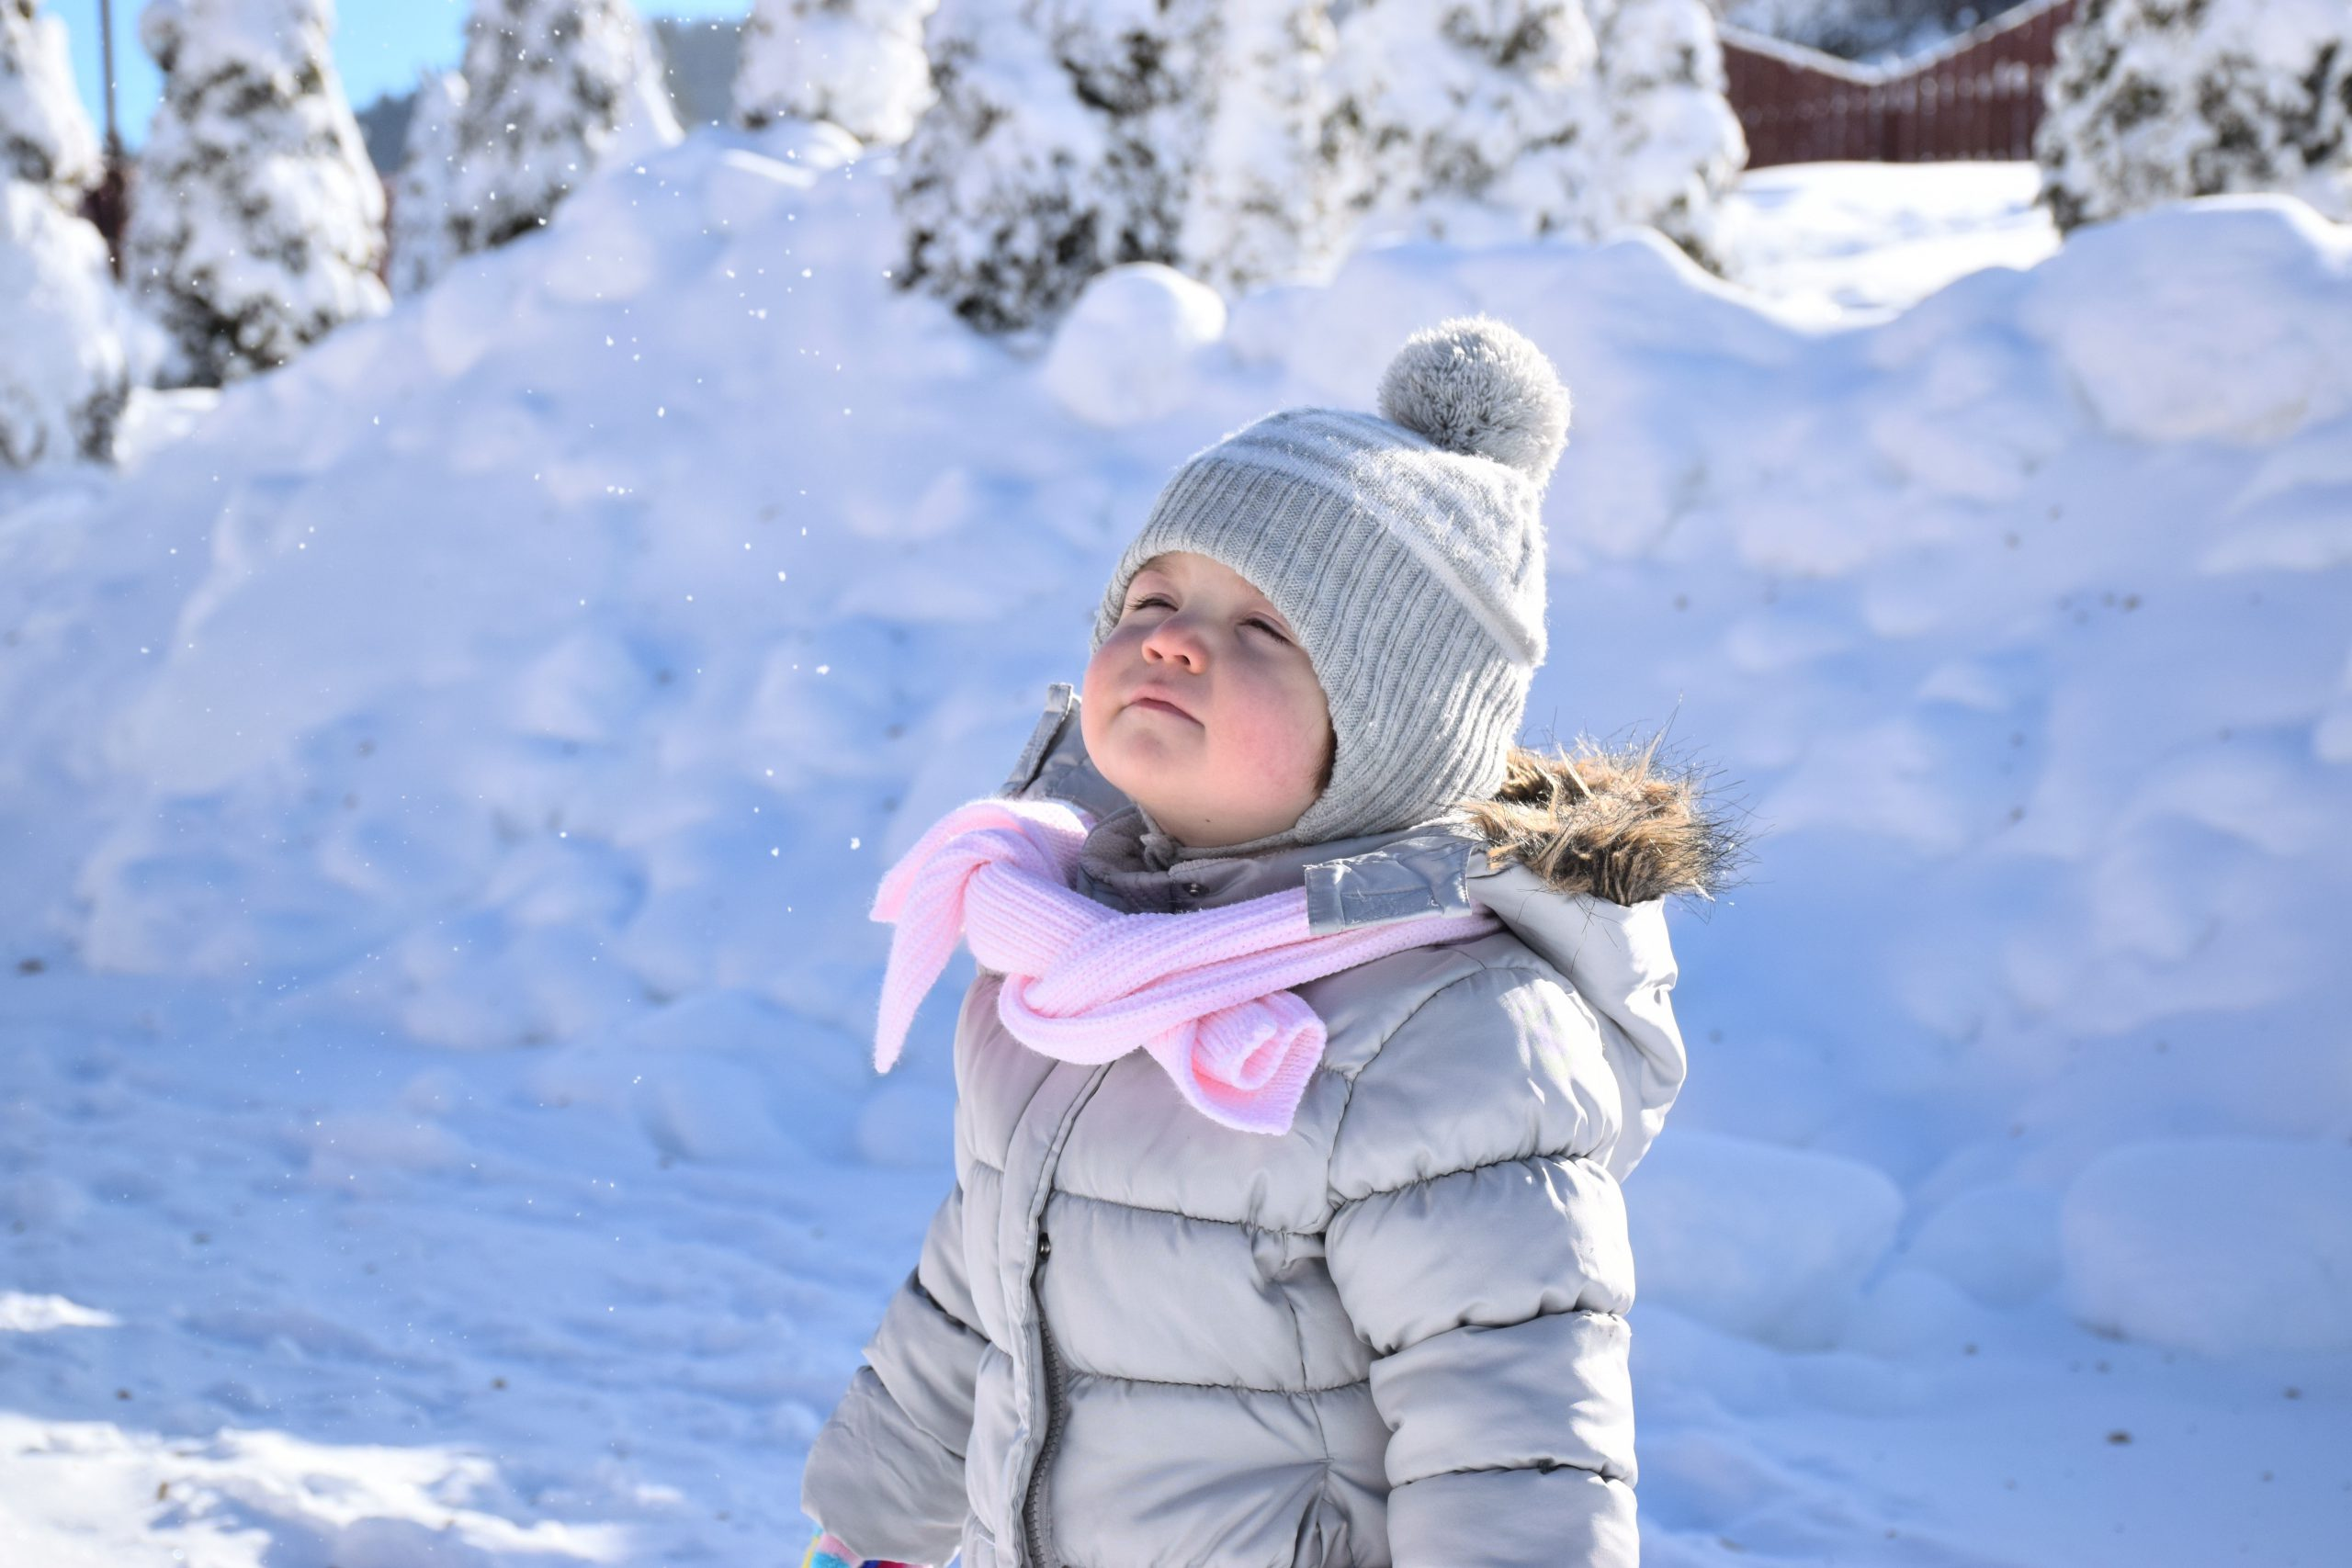 Small child in puffy winter ski jacket